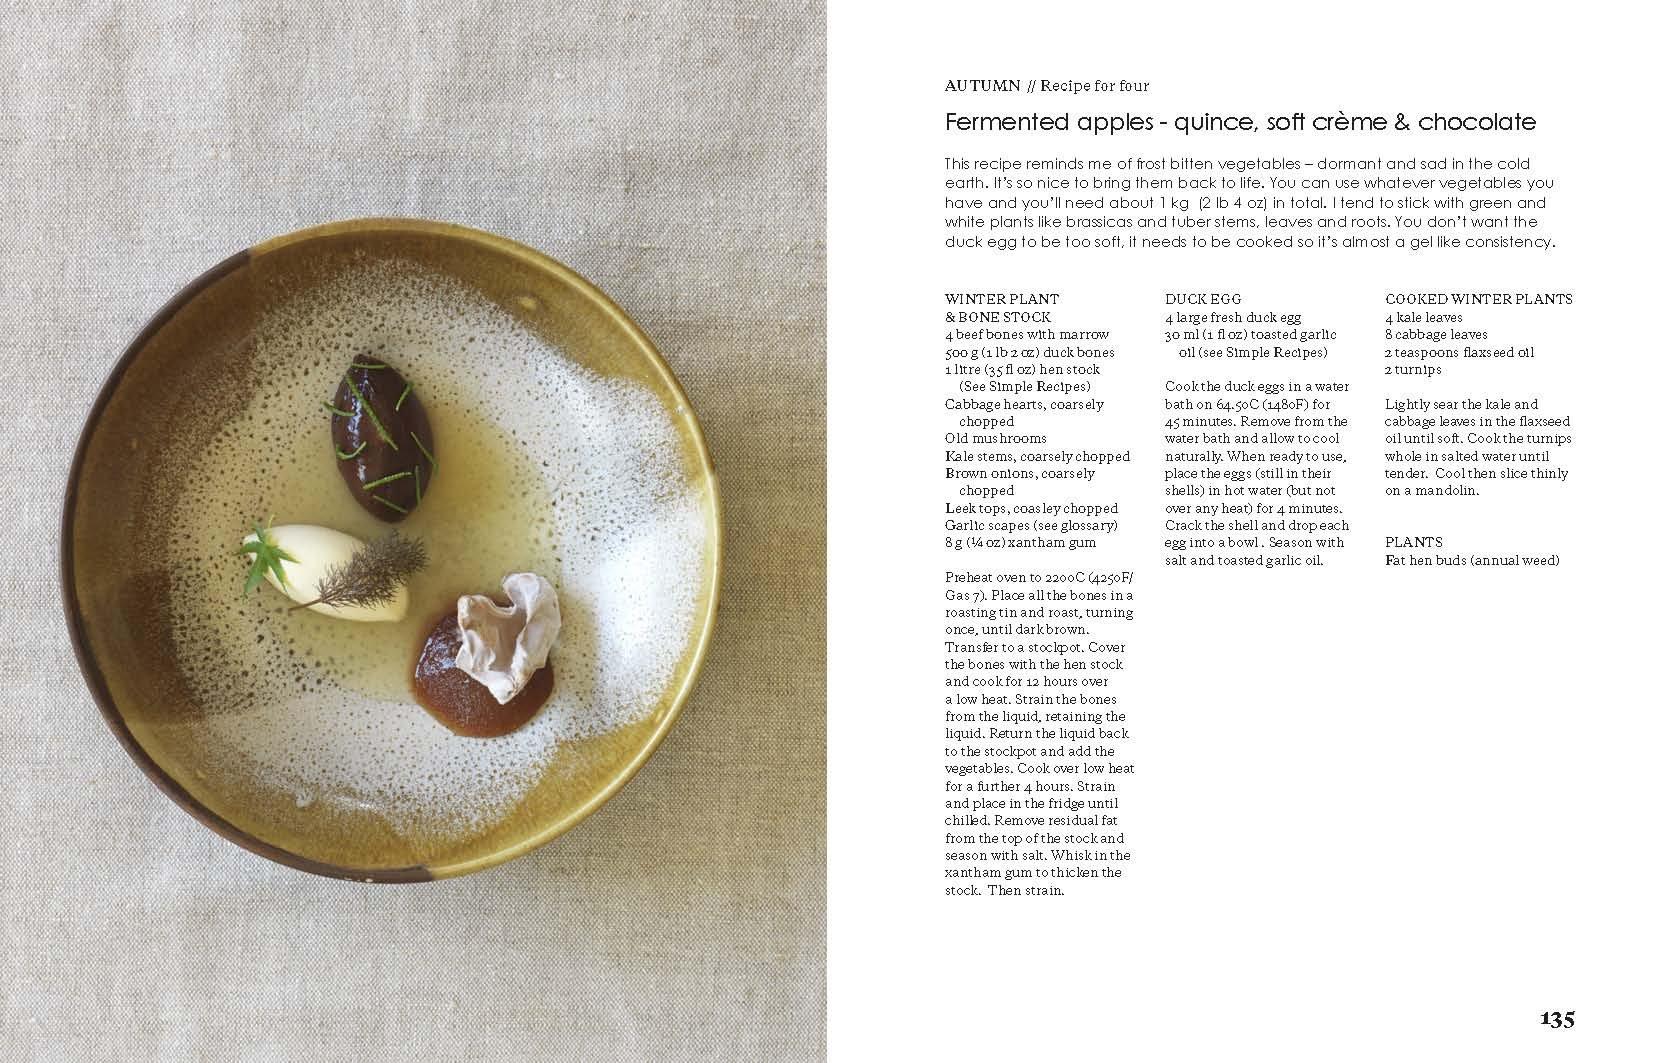 Biota: Gather, Grow, Cook. Redefining Regional Australian Food: James Viles: 9781743365700: Amazon.com: Books